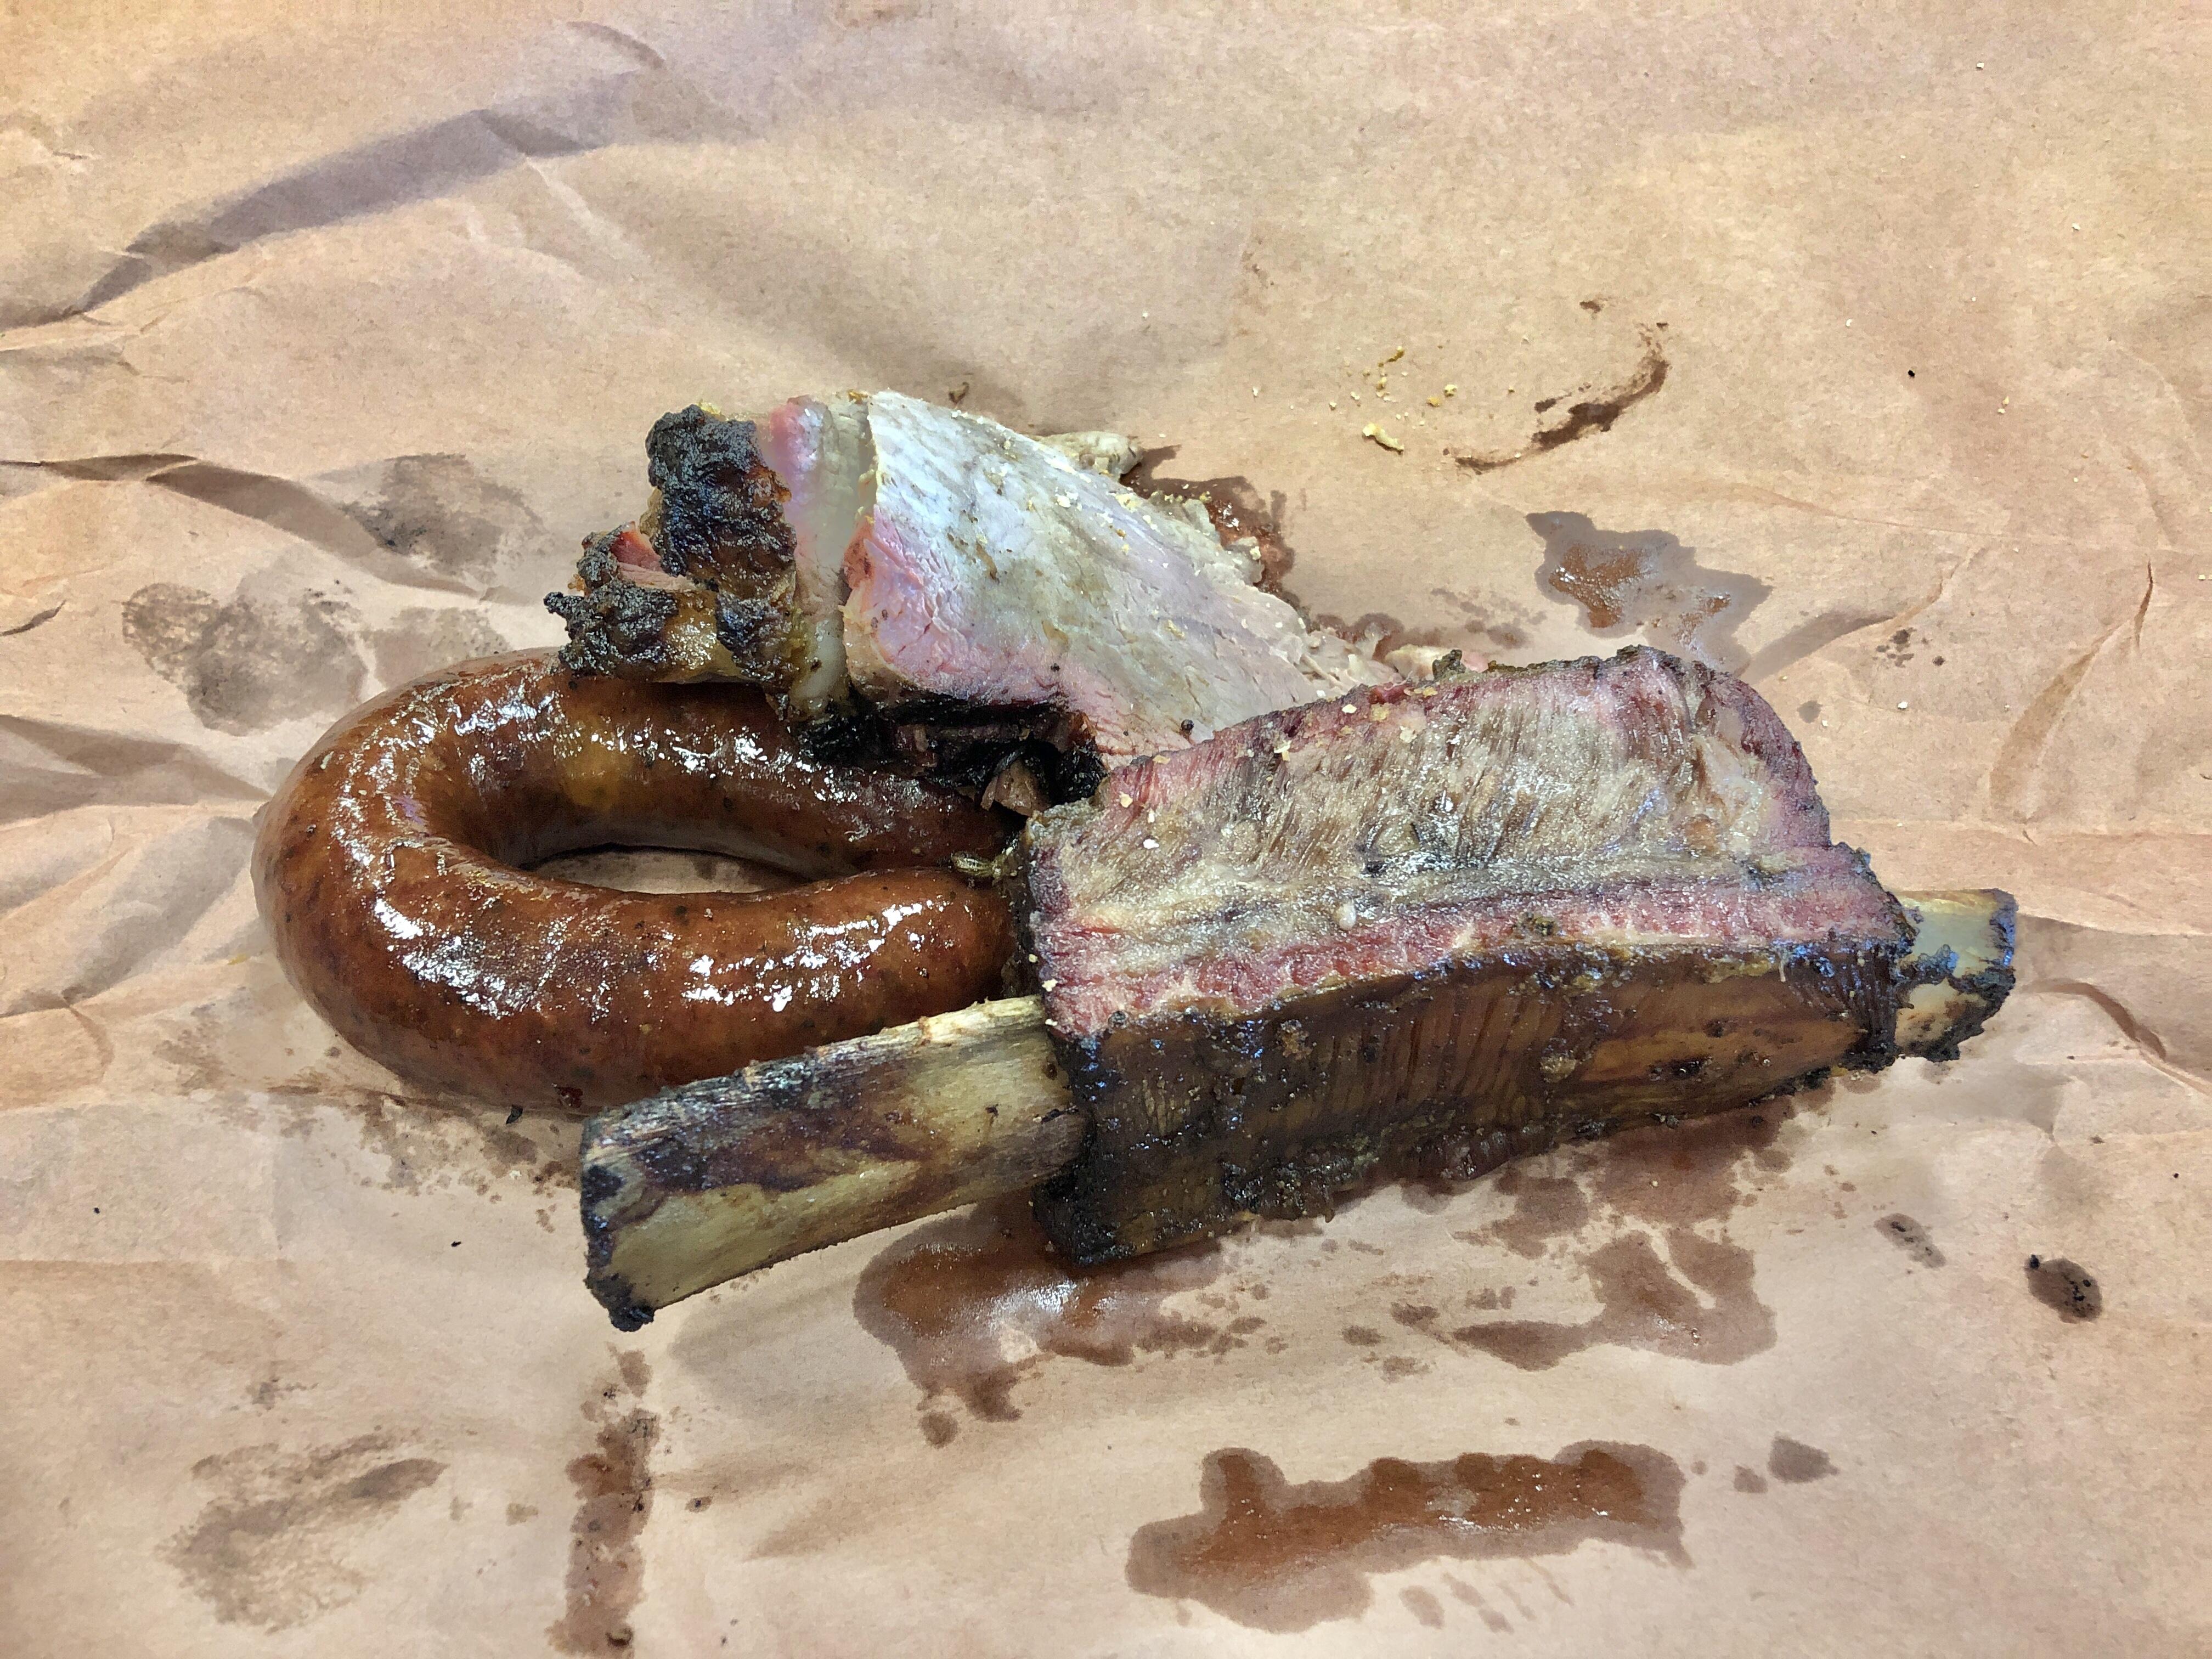 Kreuz Market barbecue in Lockhart, Texas